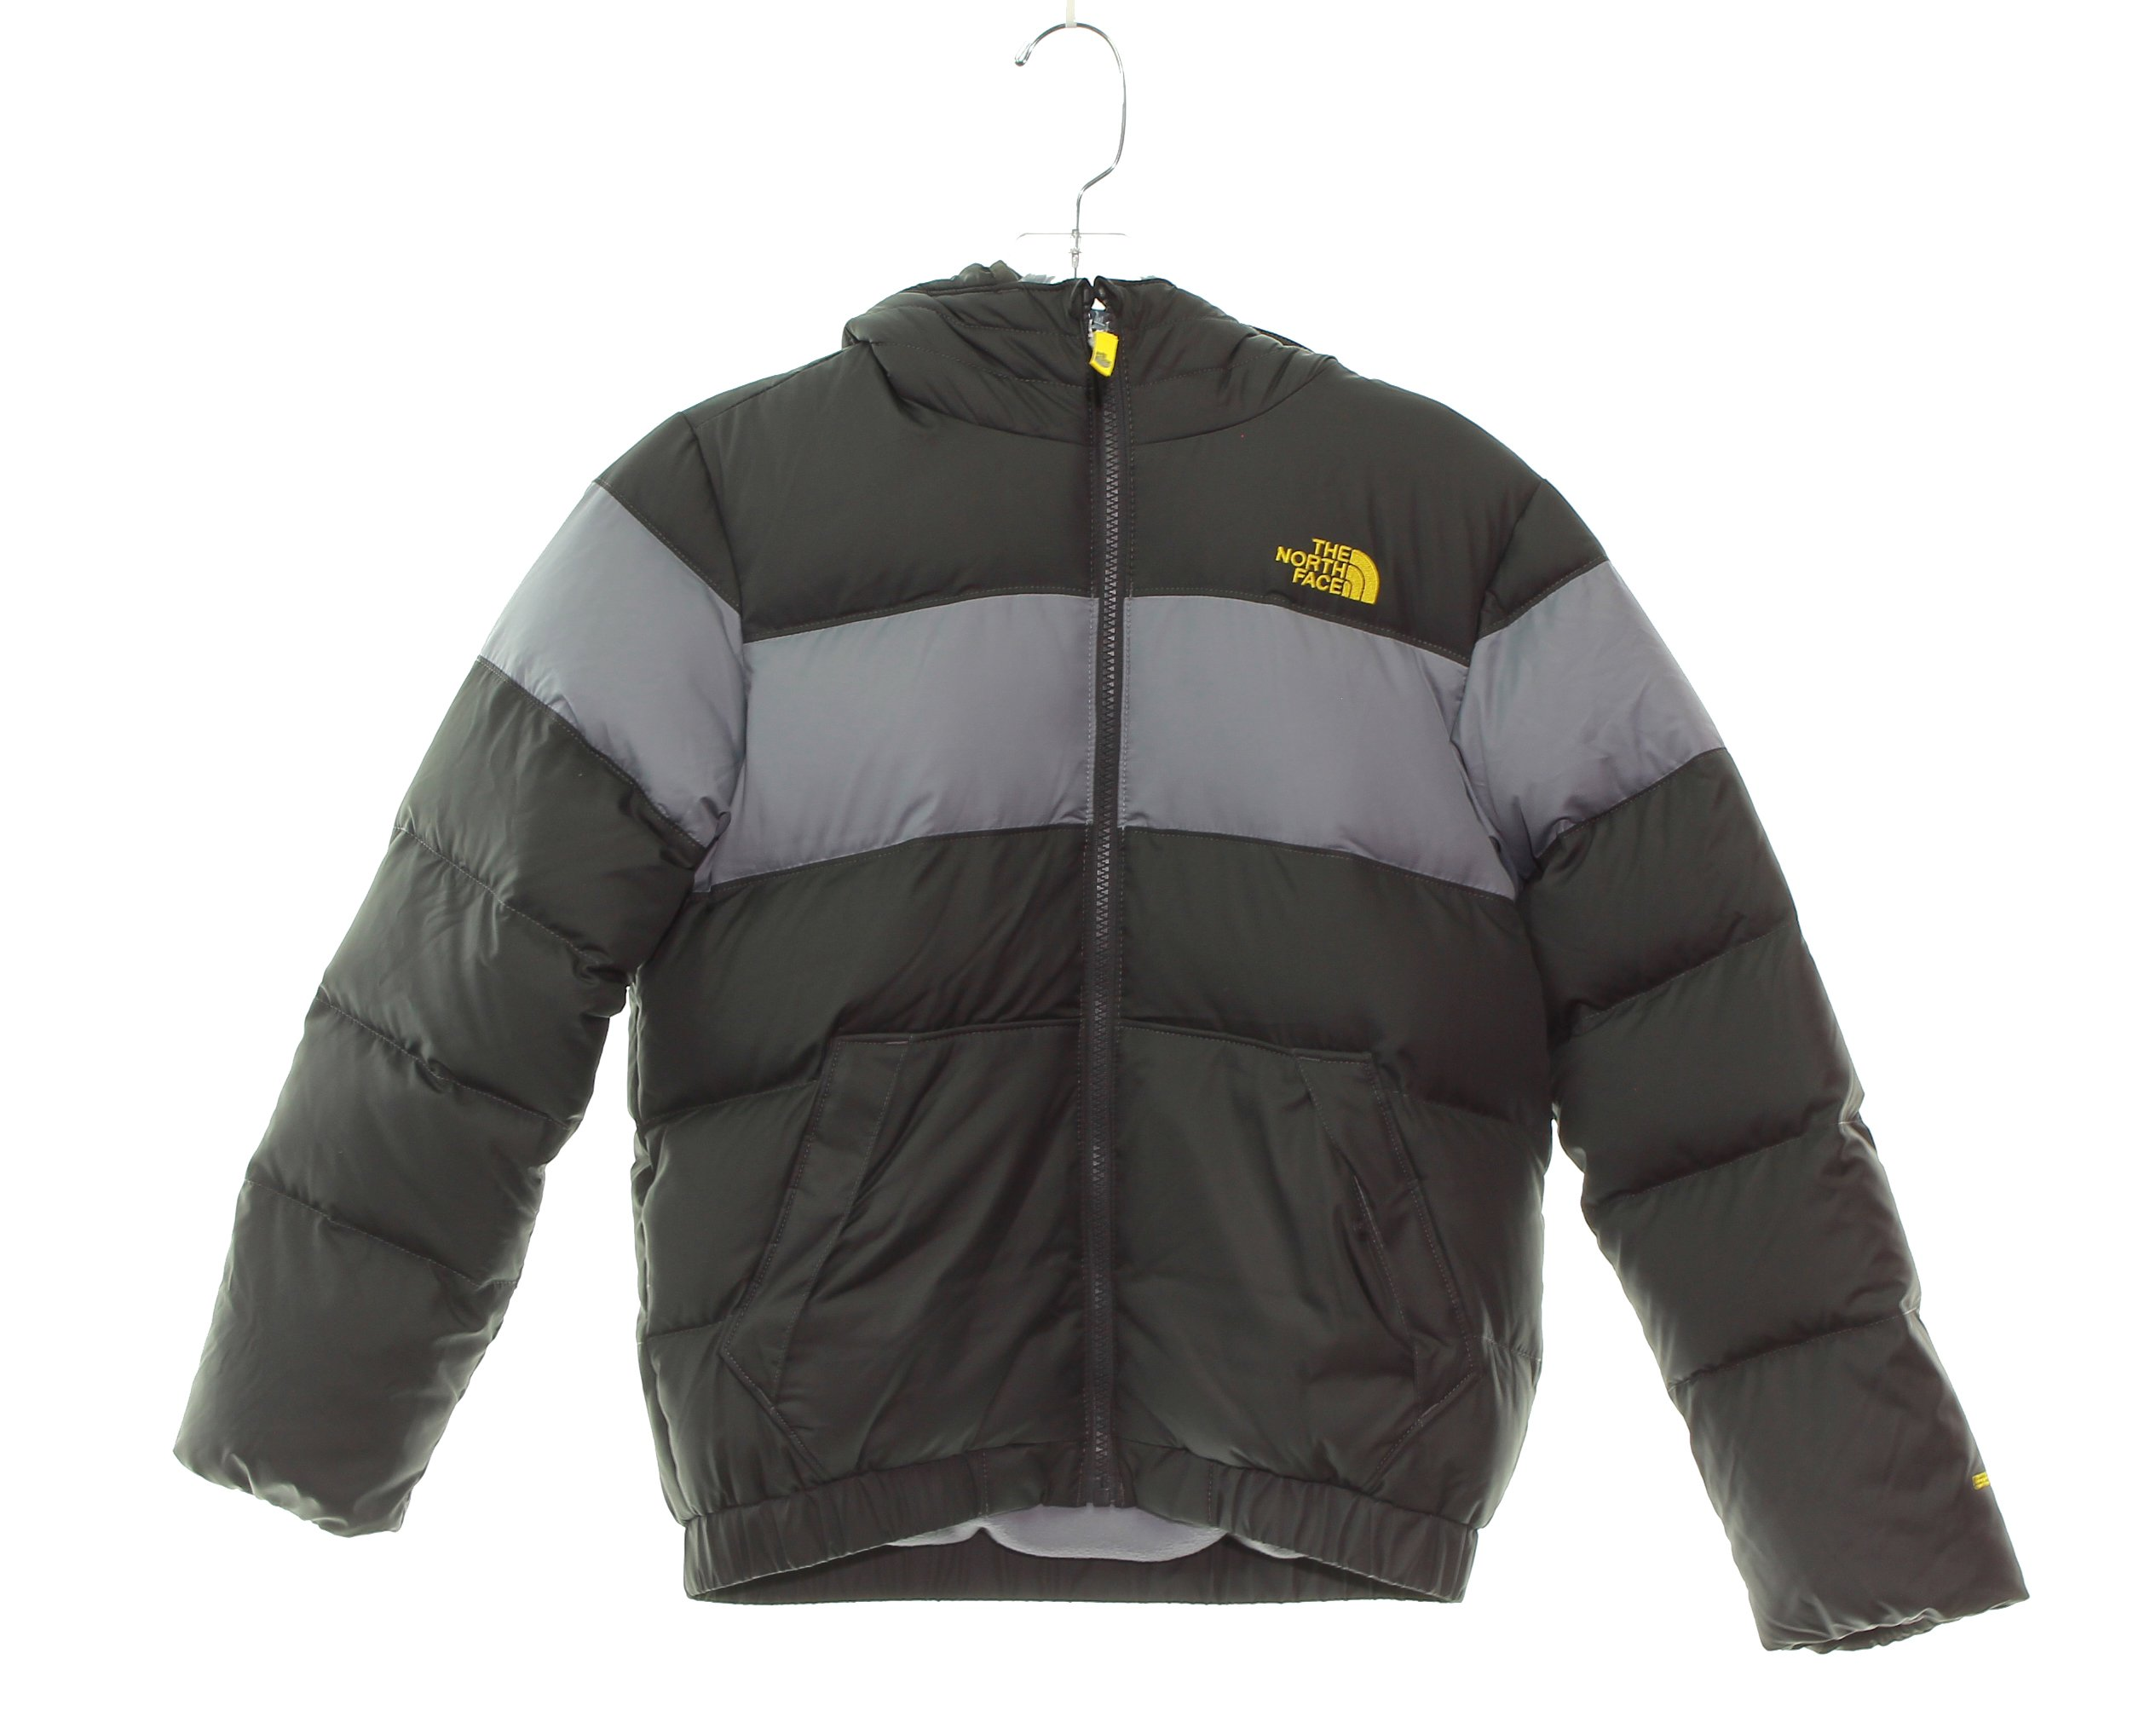 Boy's The North Face Moondoggy 2.0 Down Jacket Size 10/12 Medium Graphite Grey